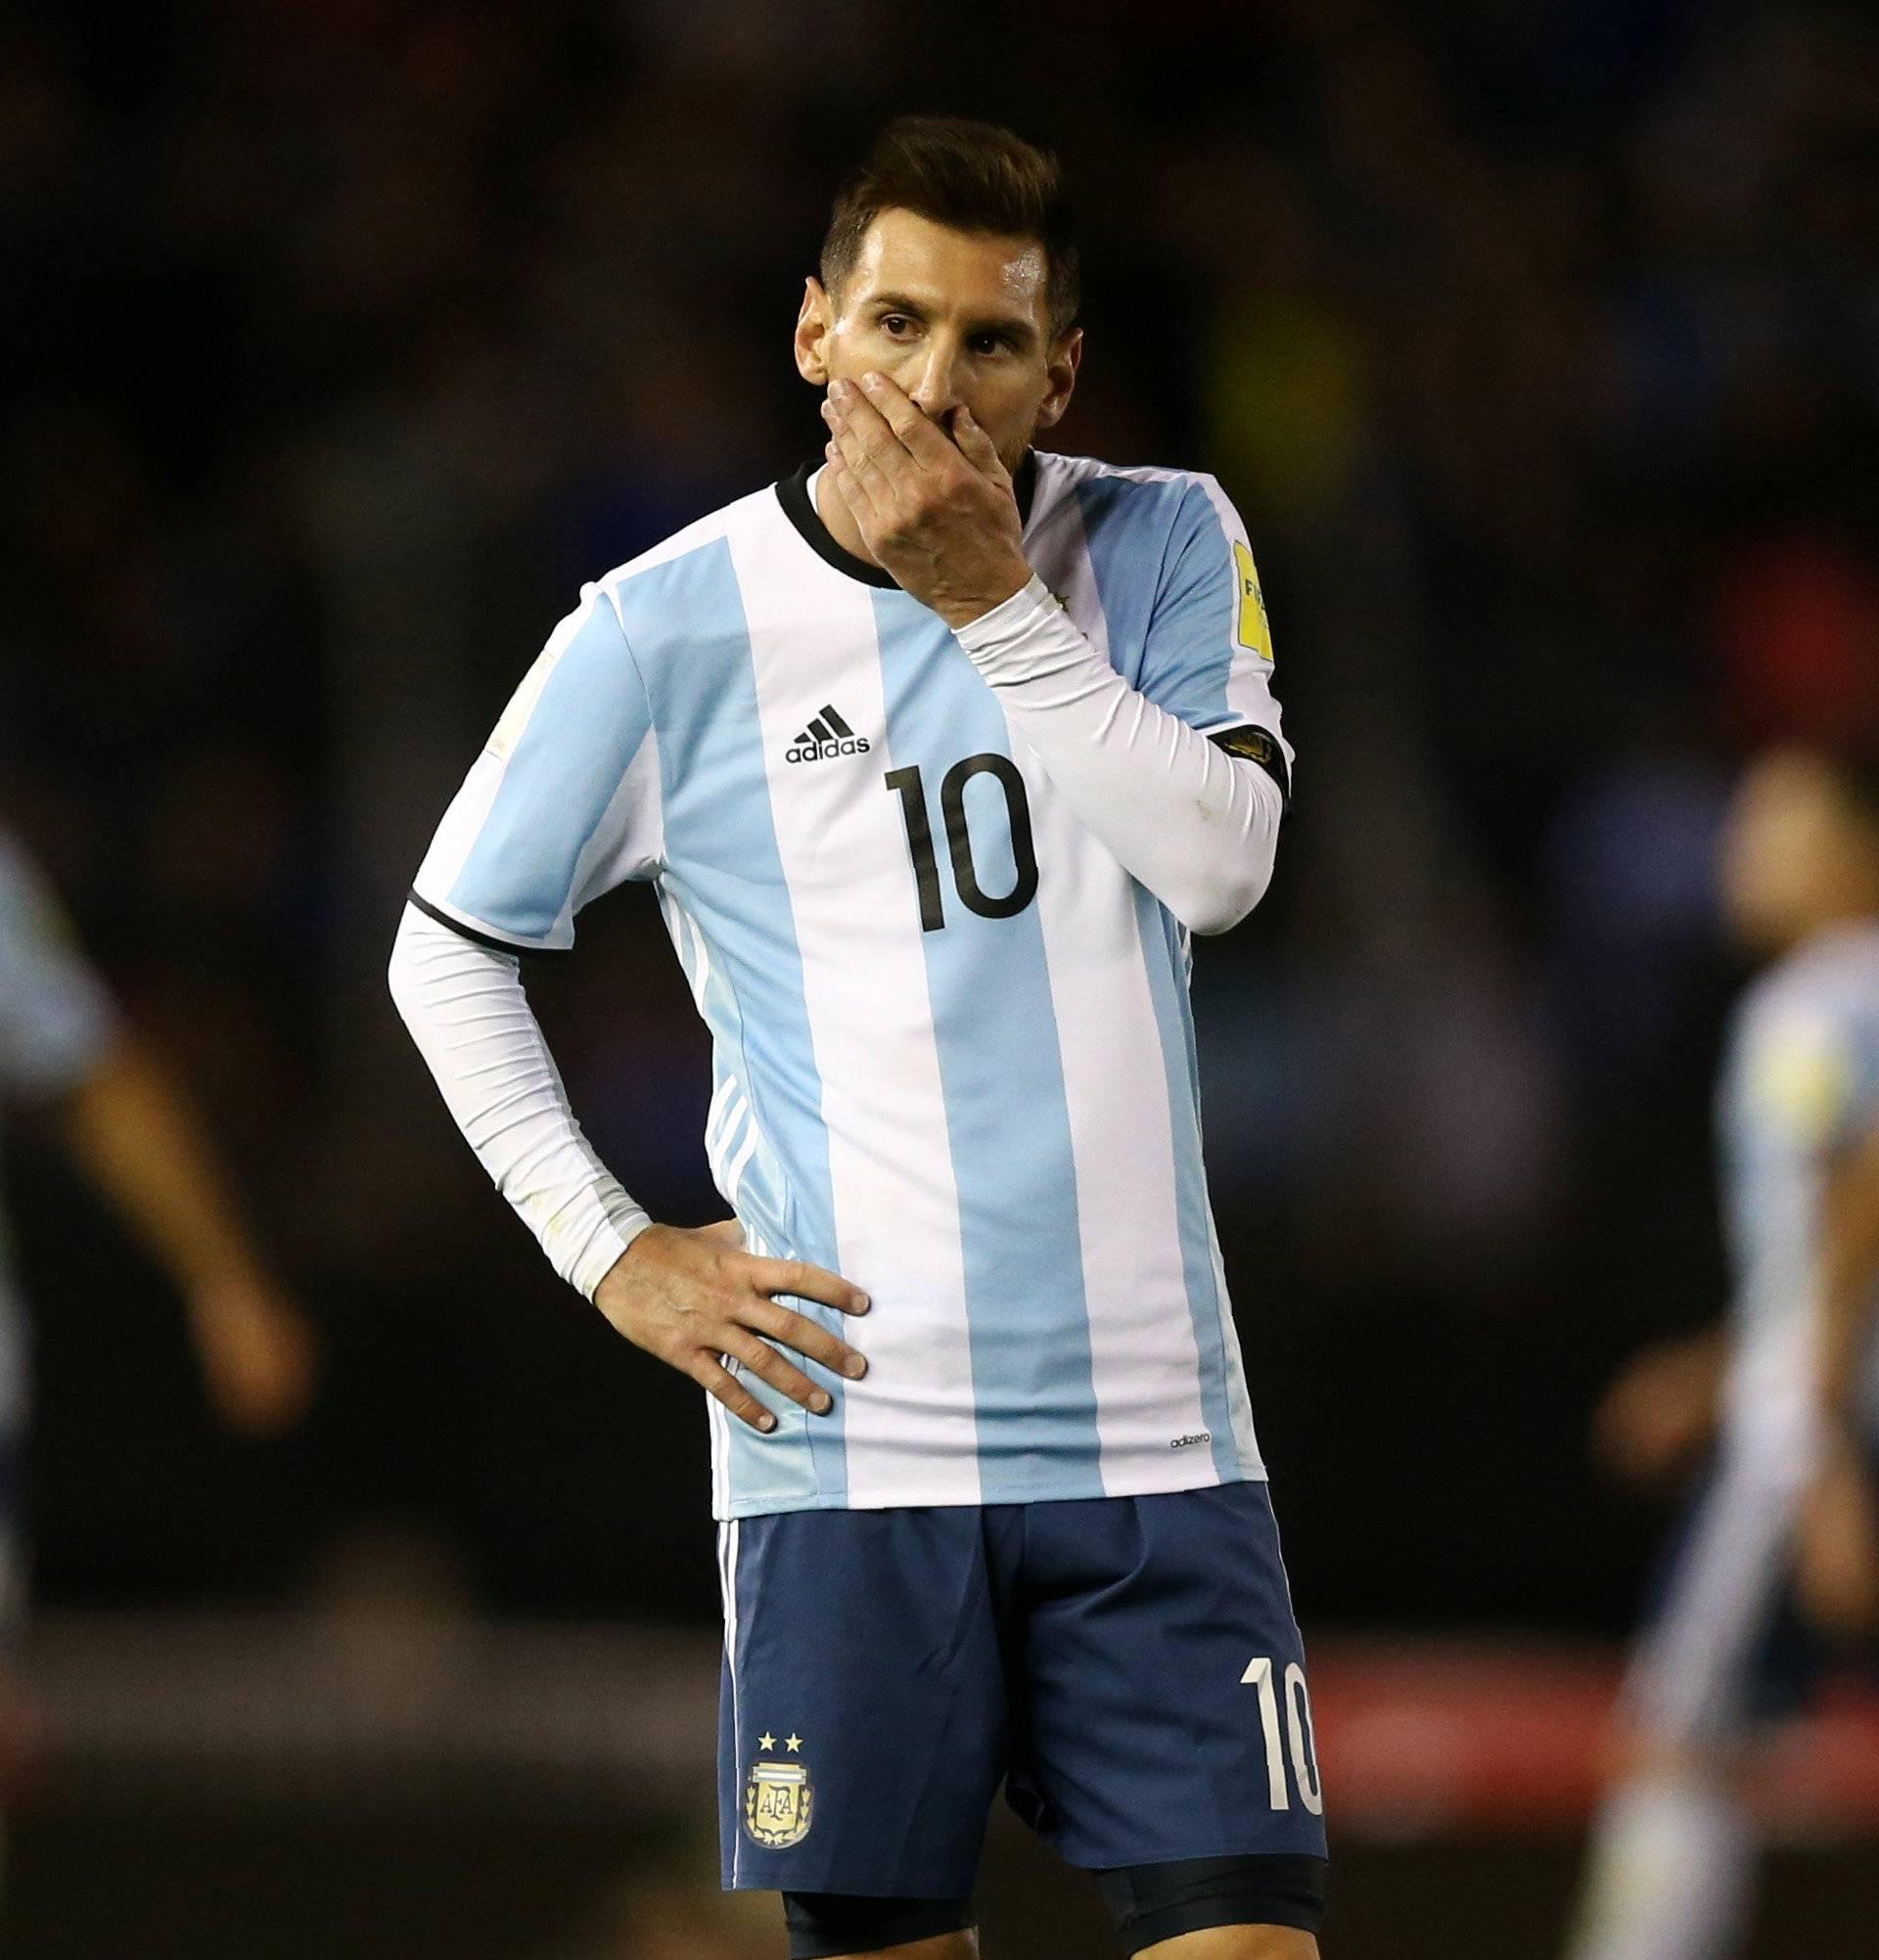 Soccer Football - 2018 World Cup Qualifiers - Argentina v Venezuela - Monumental stadium, Buenos Aires, Argentina